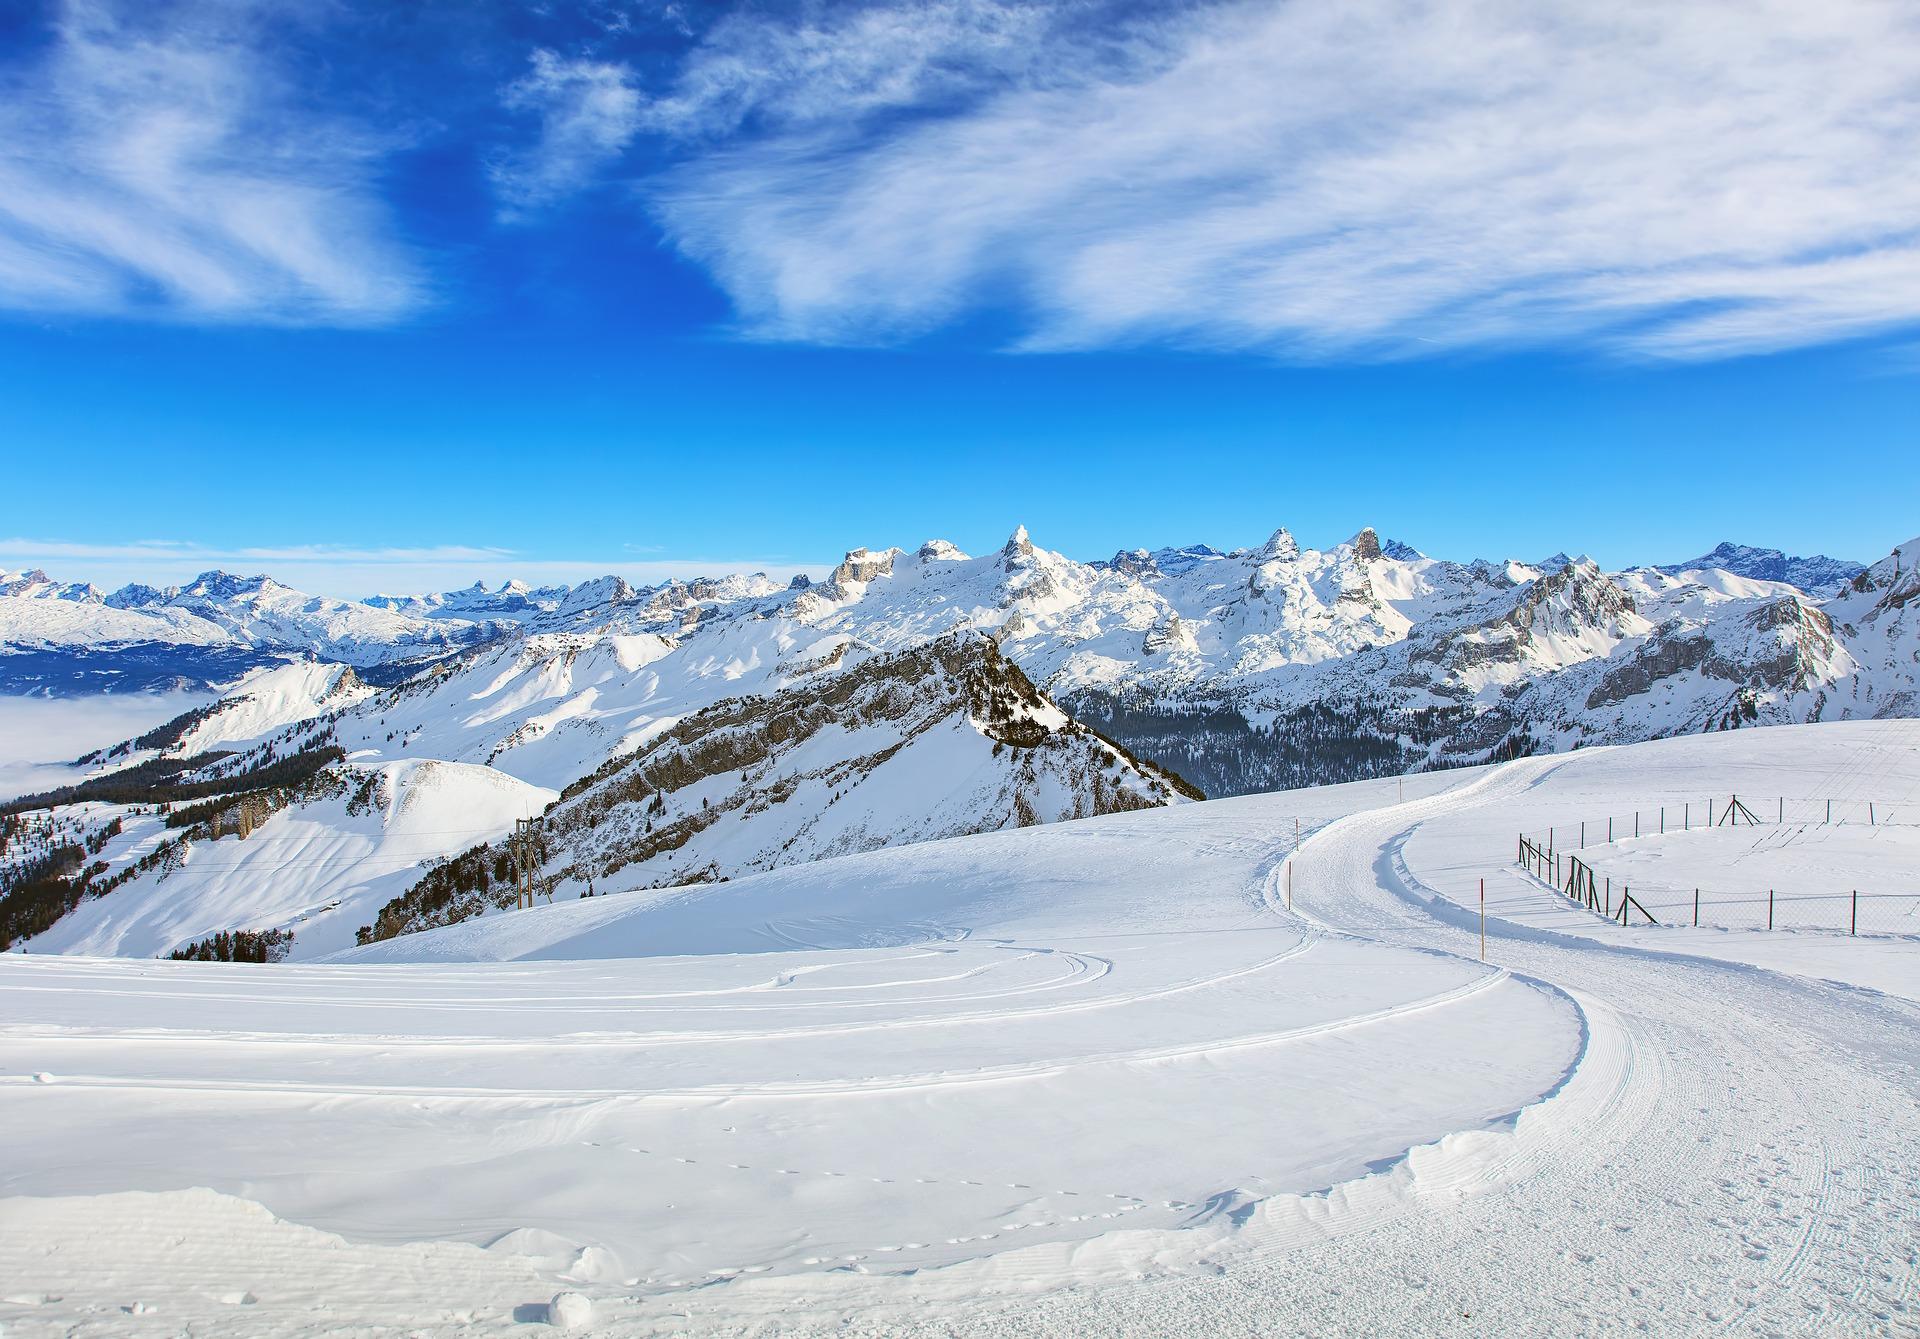 svizzera sci